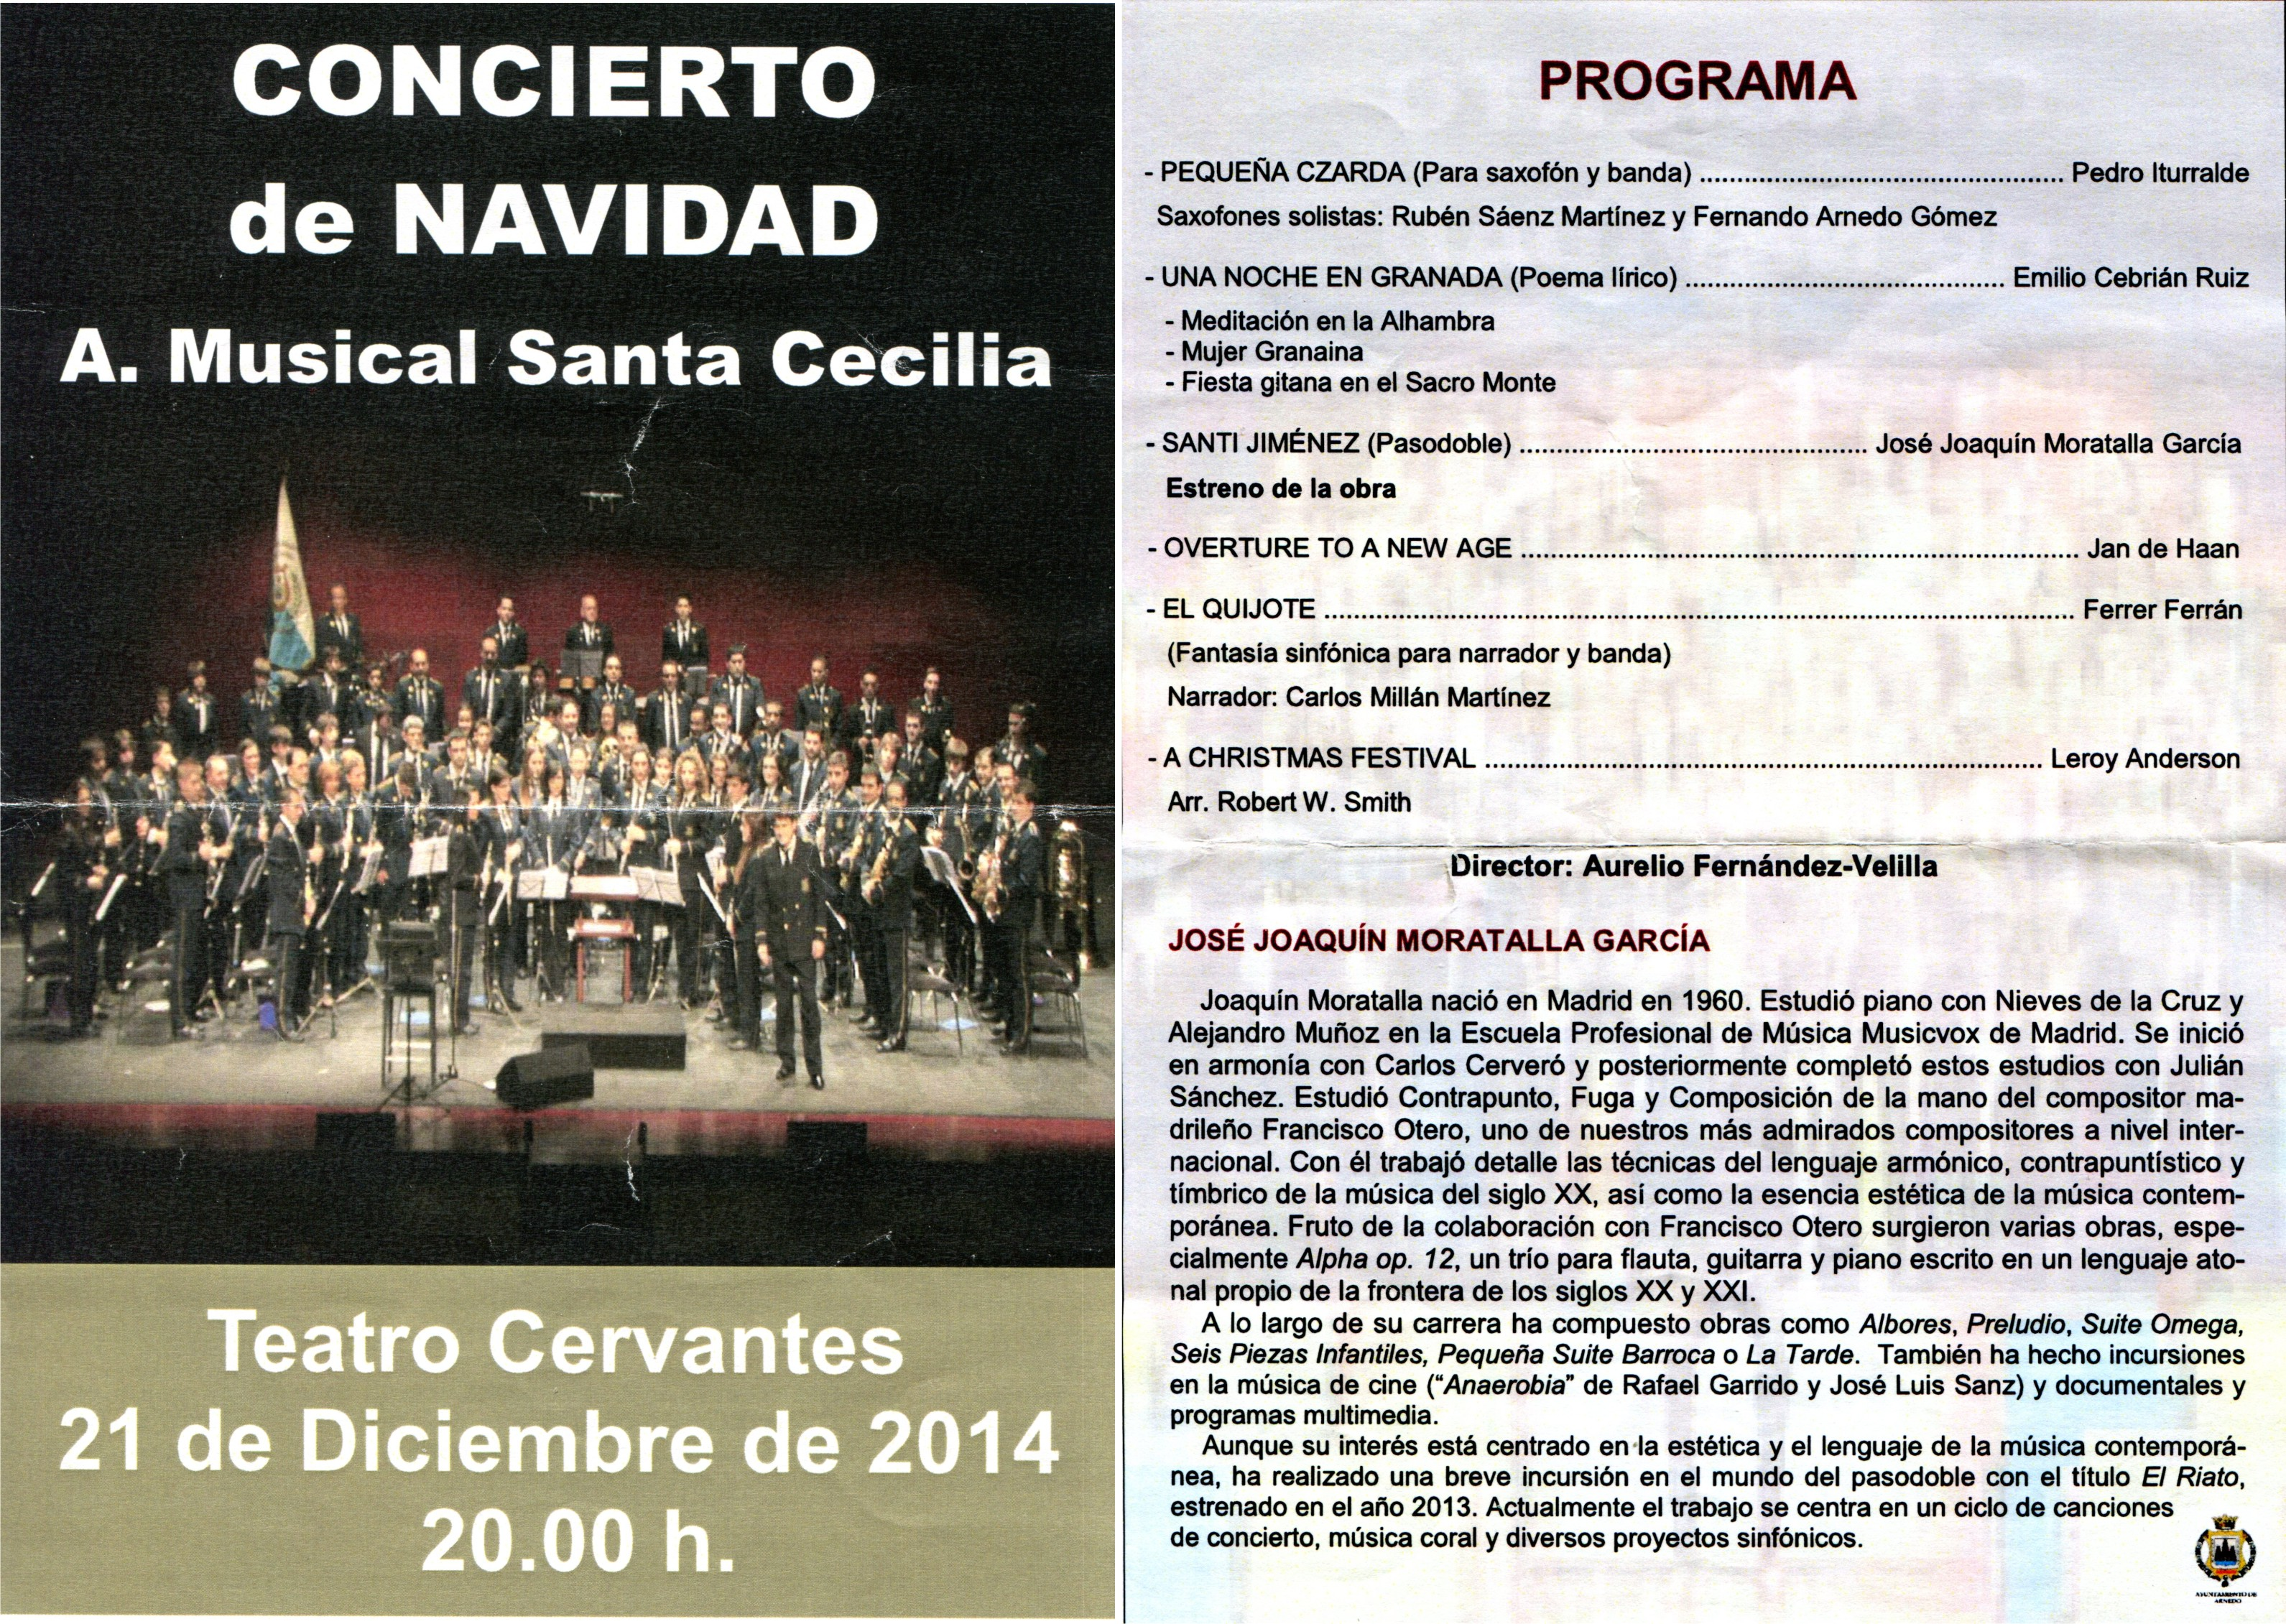 Teatro Cervantes_programa de mano